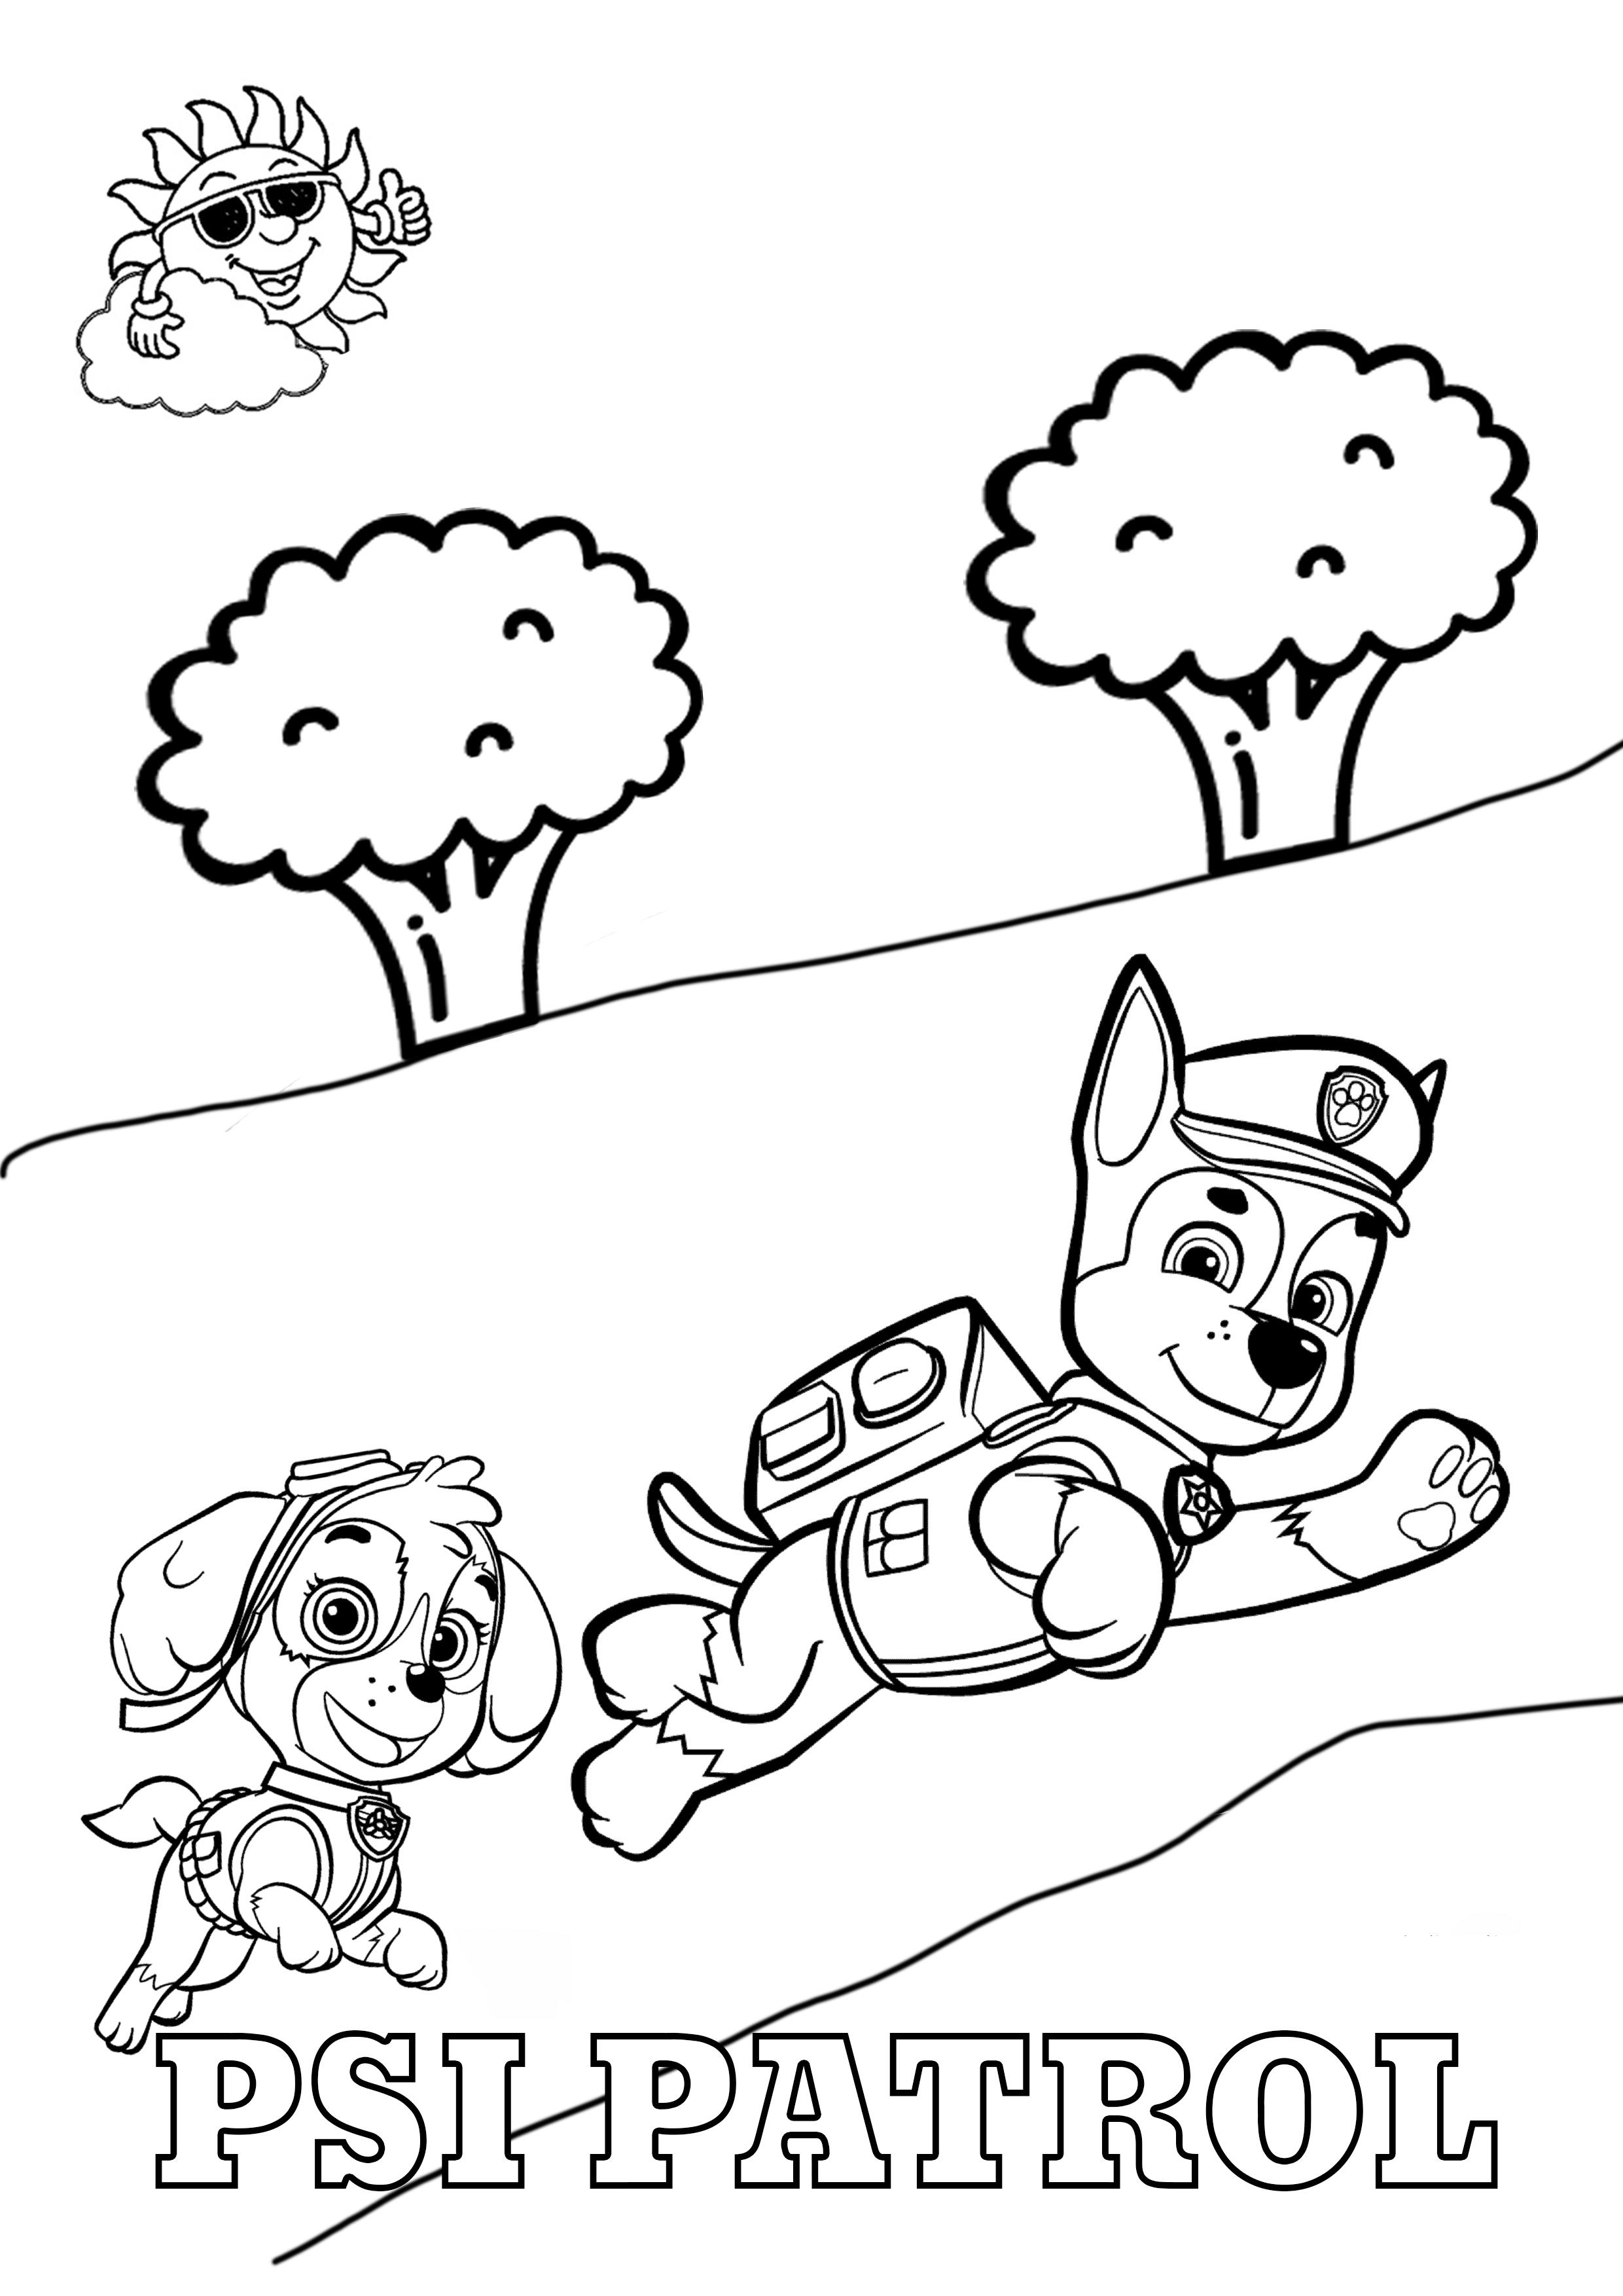 Kolorowanki Psi Patrol do druku - Chase i Skye